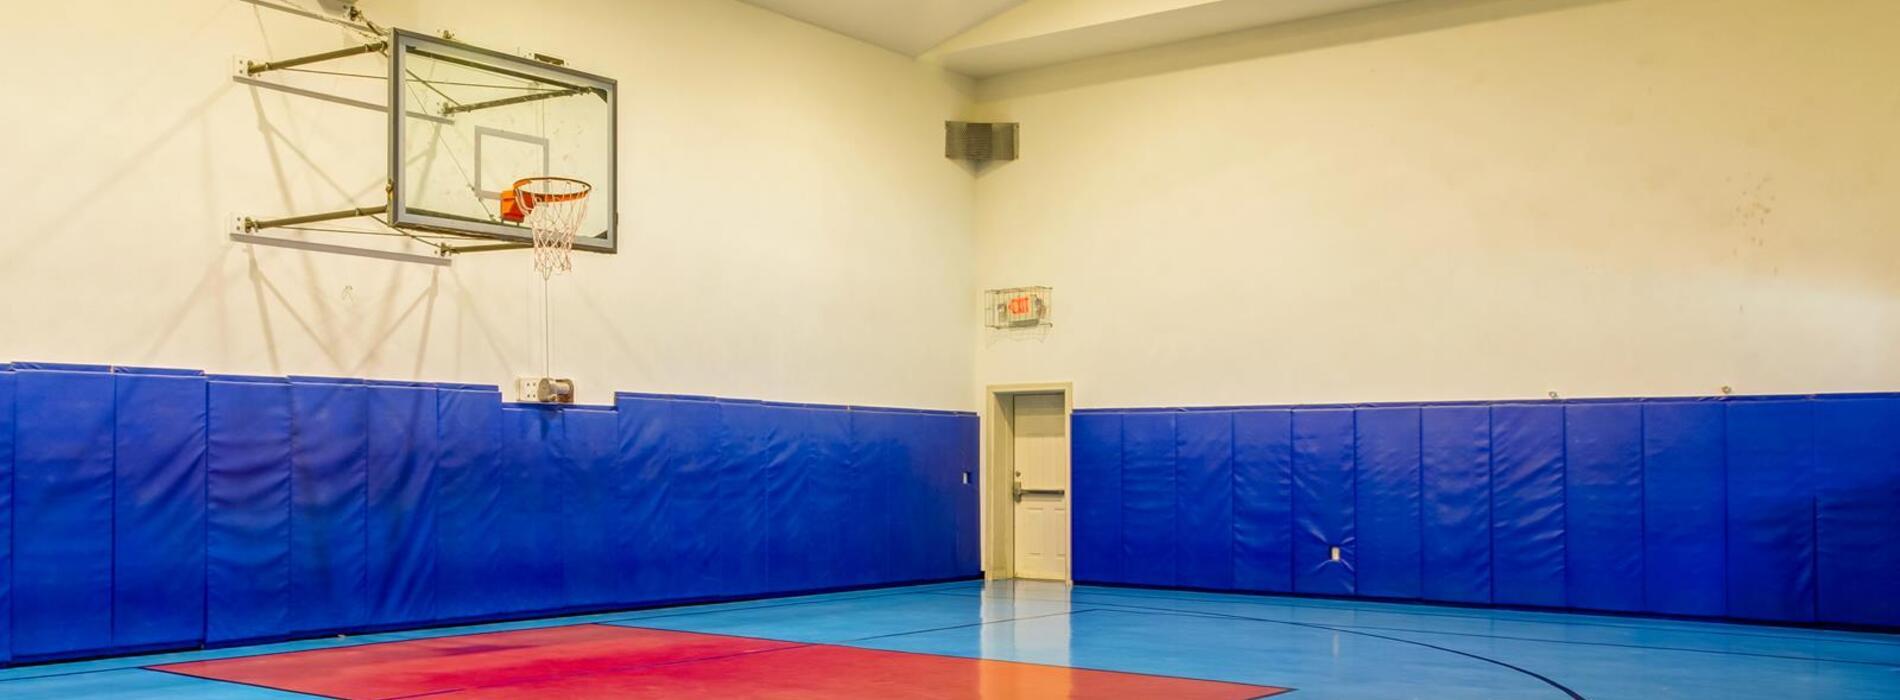 100 how to build a backyard basketball court best 25